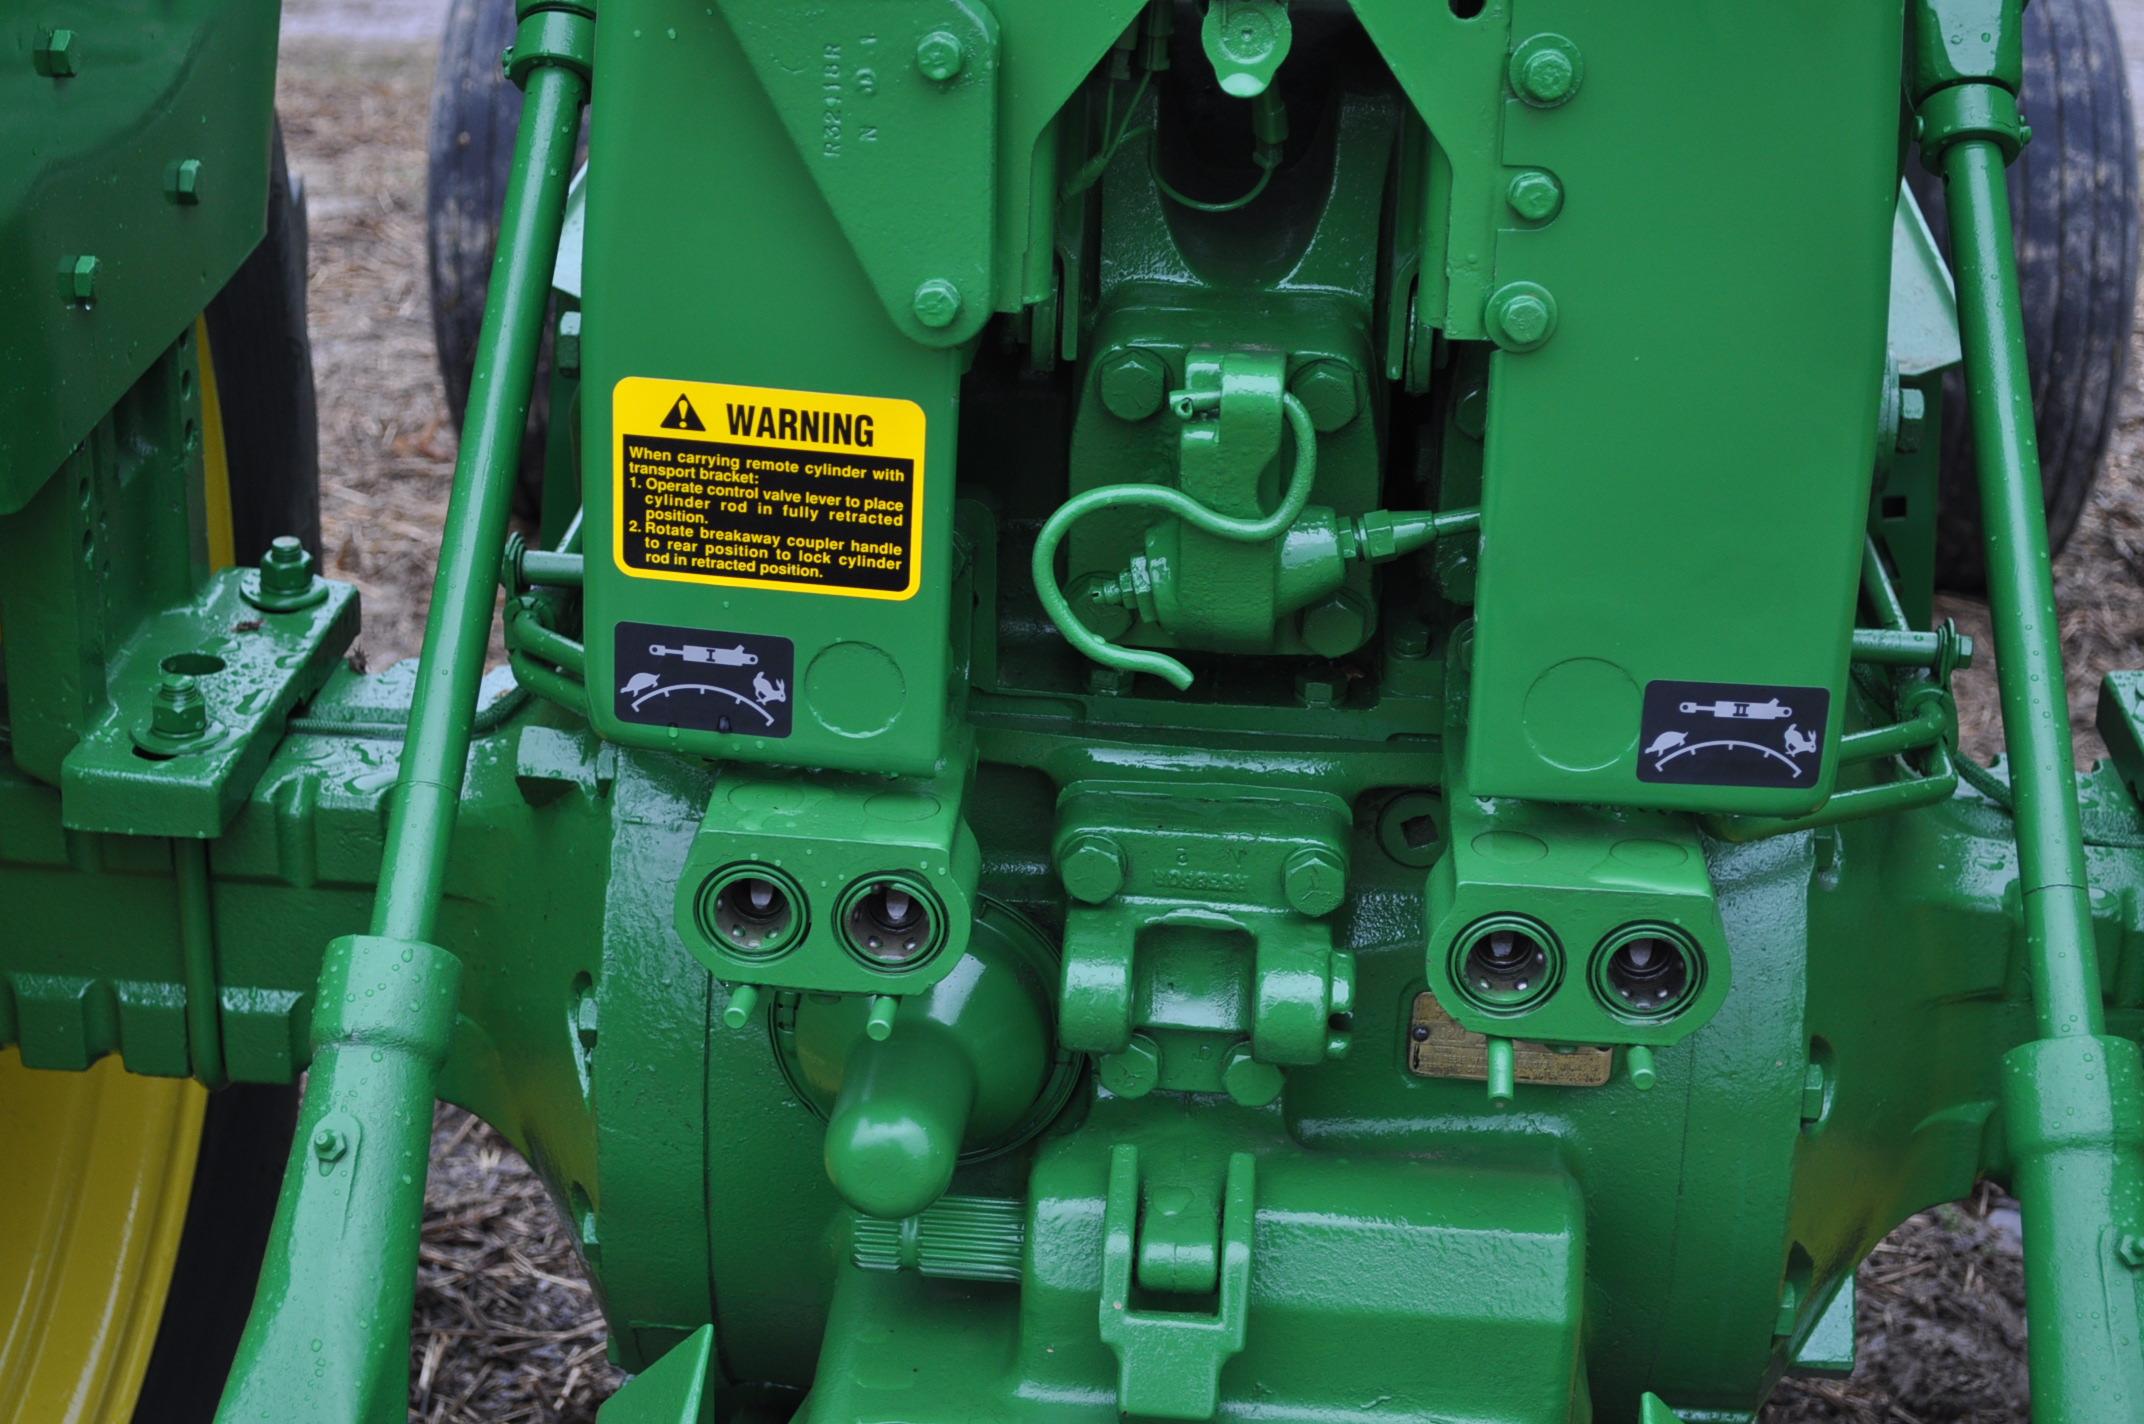 John Deere 4020 powershift, major overhaul on motor, 12V system, dual hyd remotes, wide front, 7,130 - Image 14 of 18